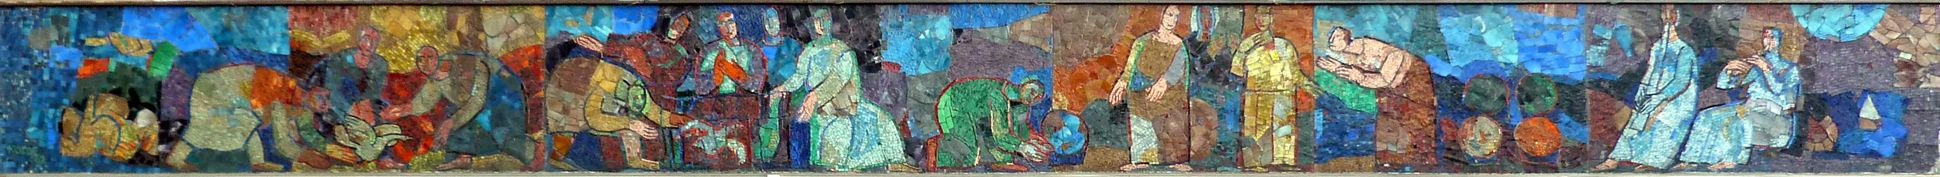 Mosaik am Hauptmarkt in Nürnberg Mosaikband der Nordseite